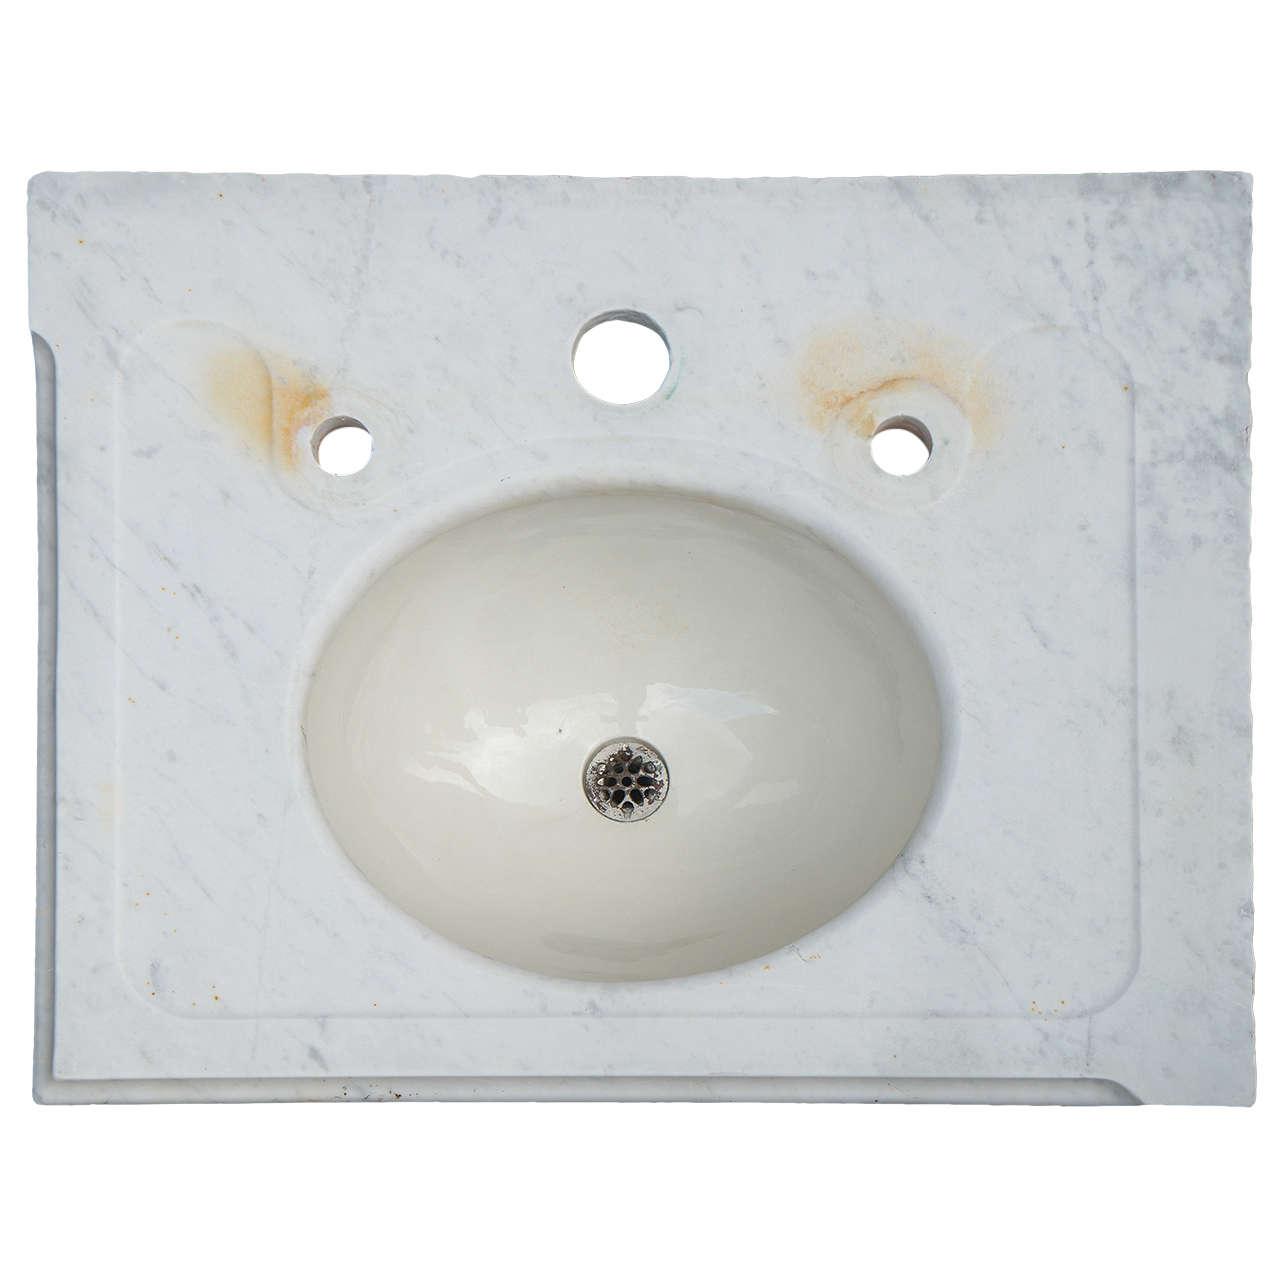 vintage marble vanity sink top vintage 1930s kitchen sink at 1stdibs  rh   1stdibs com